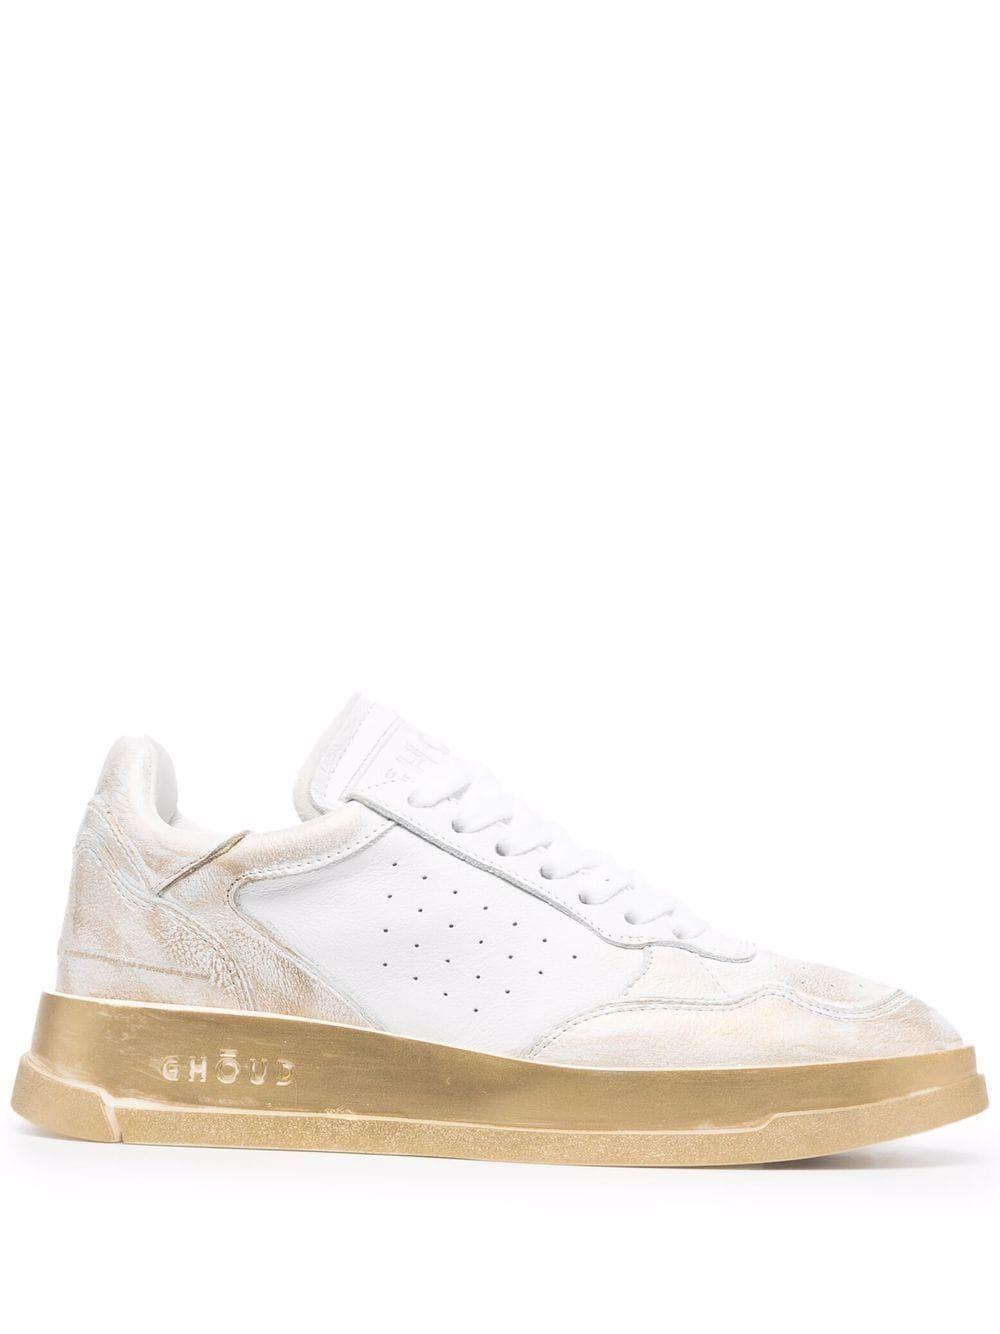 Tweener leather sneakers